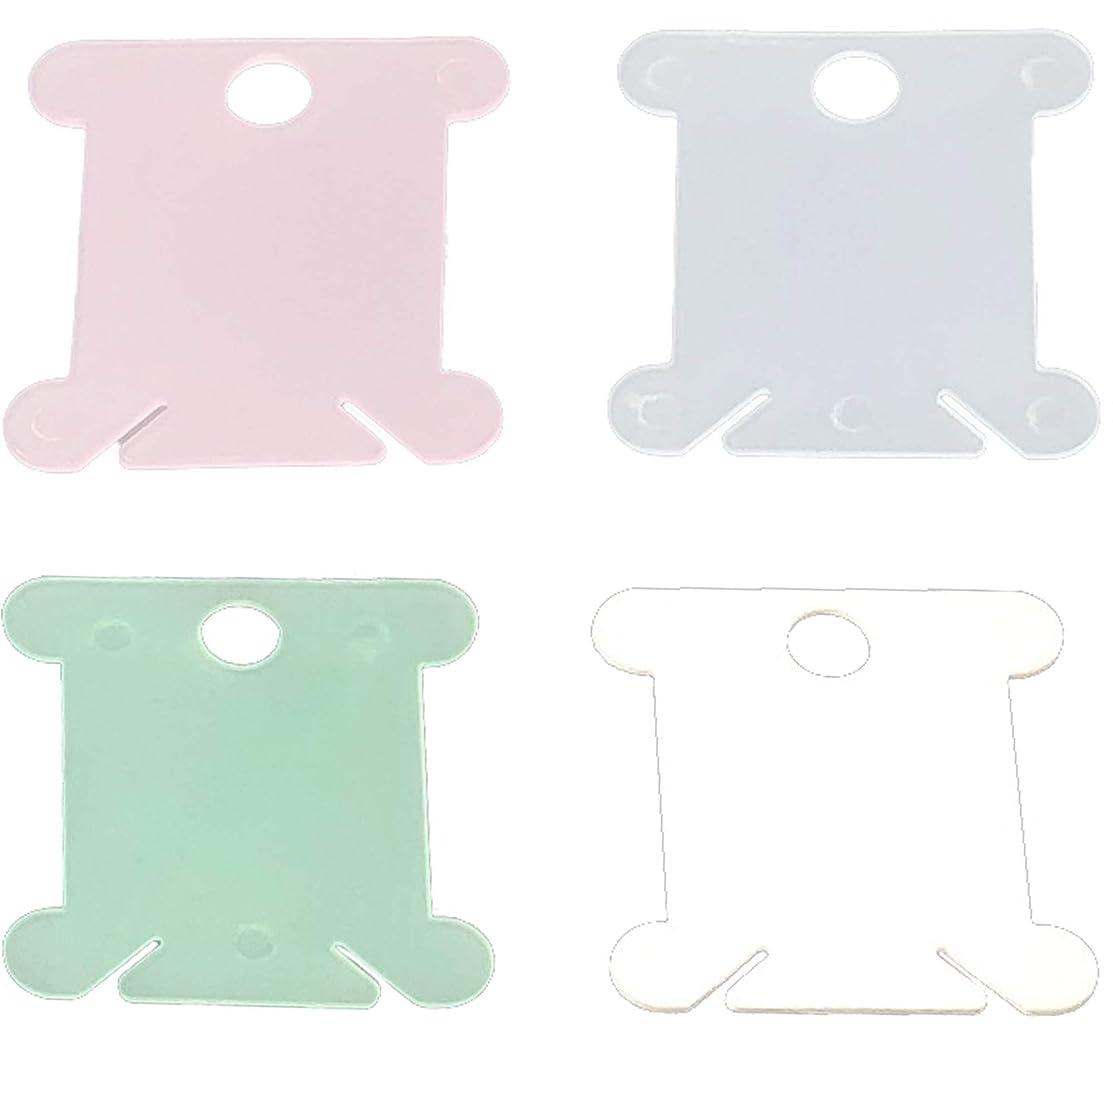 Rusoji 200pcs Plastic Bobbins Card Organizer for Thread, Embroidery, Floss, Cross Stitch, DIY Craft, Sewing Storage (Assorted)